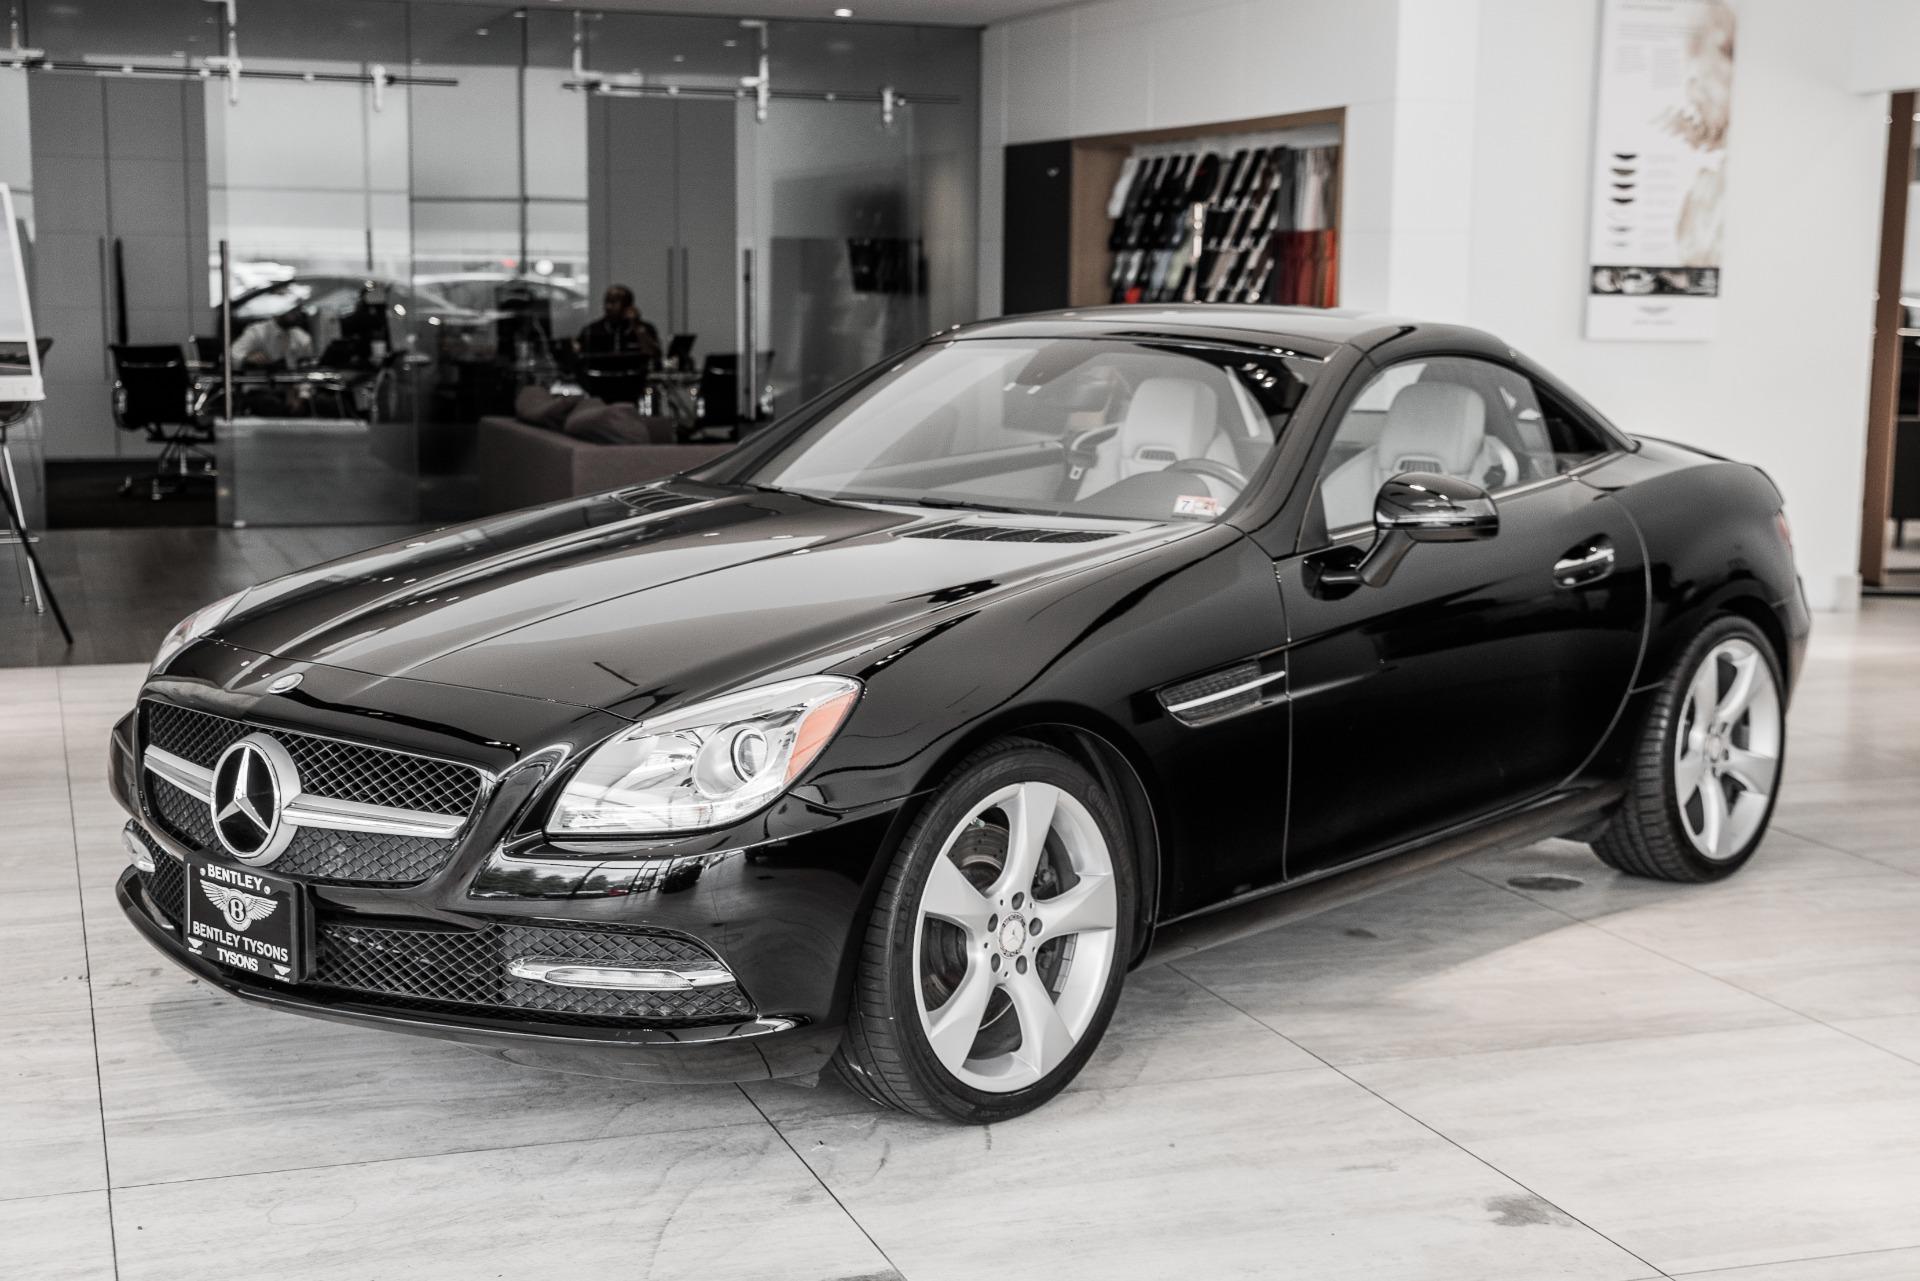 Used-2012-Mercedes-Benz-SLK-Class-SLK-350-4MATIC